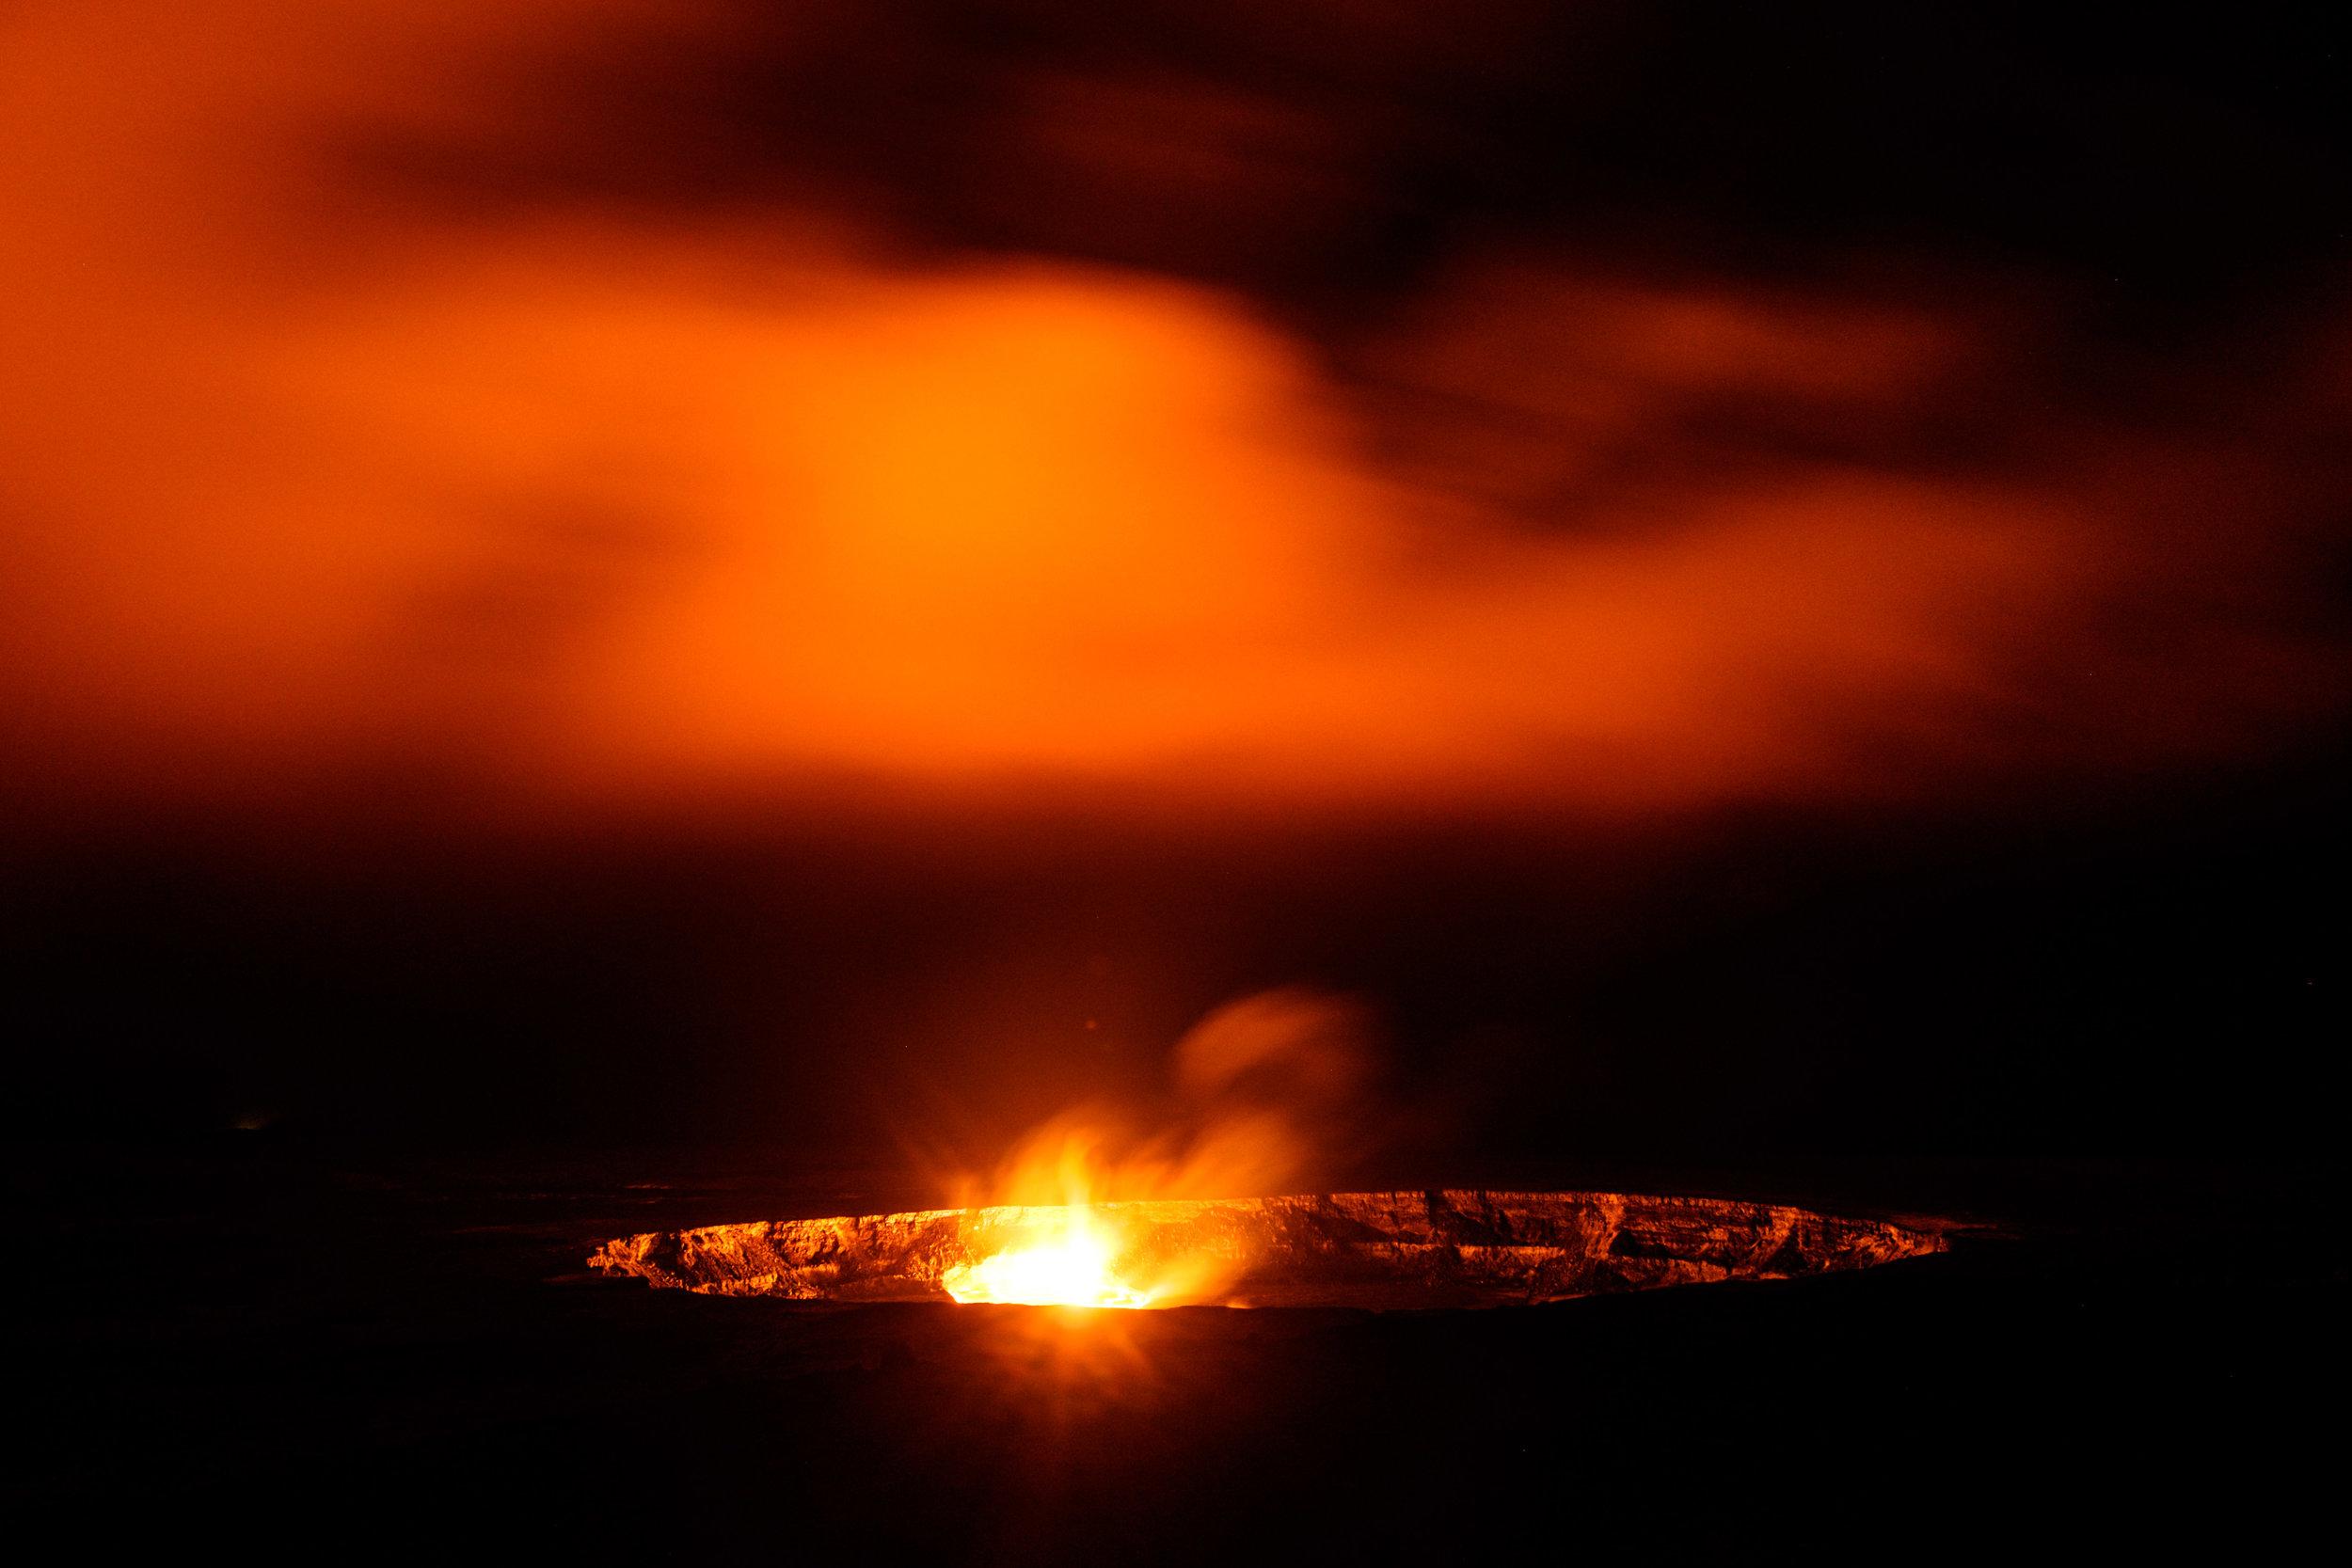 Lava lights up the black sky at night at the Halema'uma'u crater.